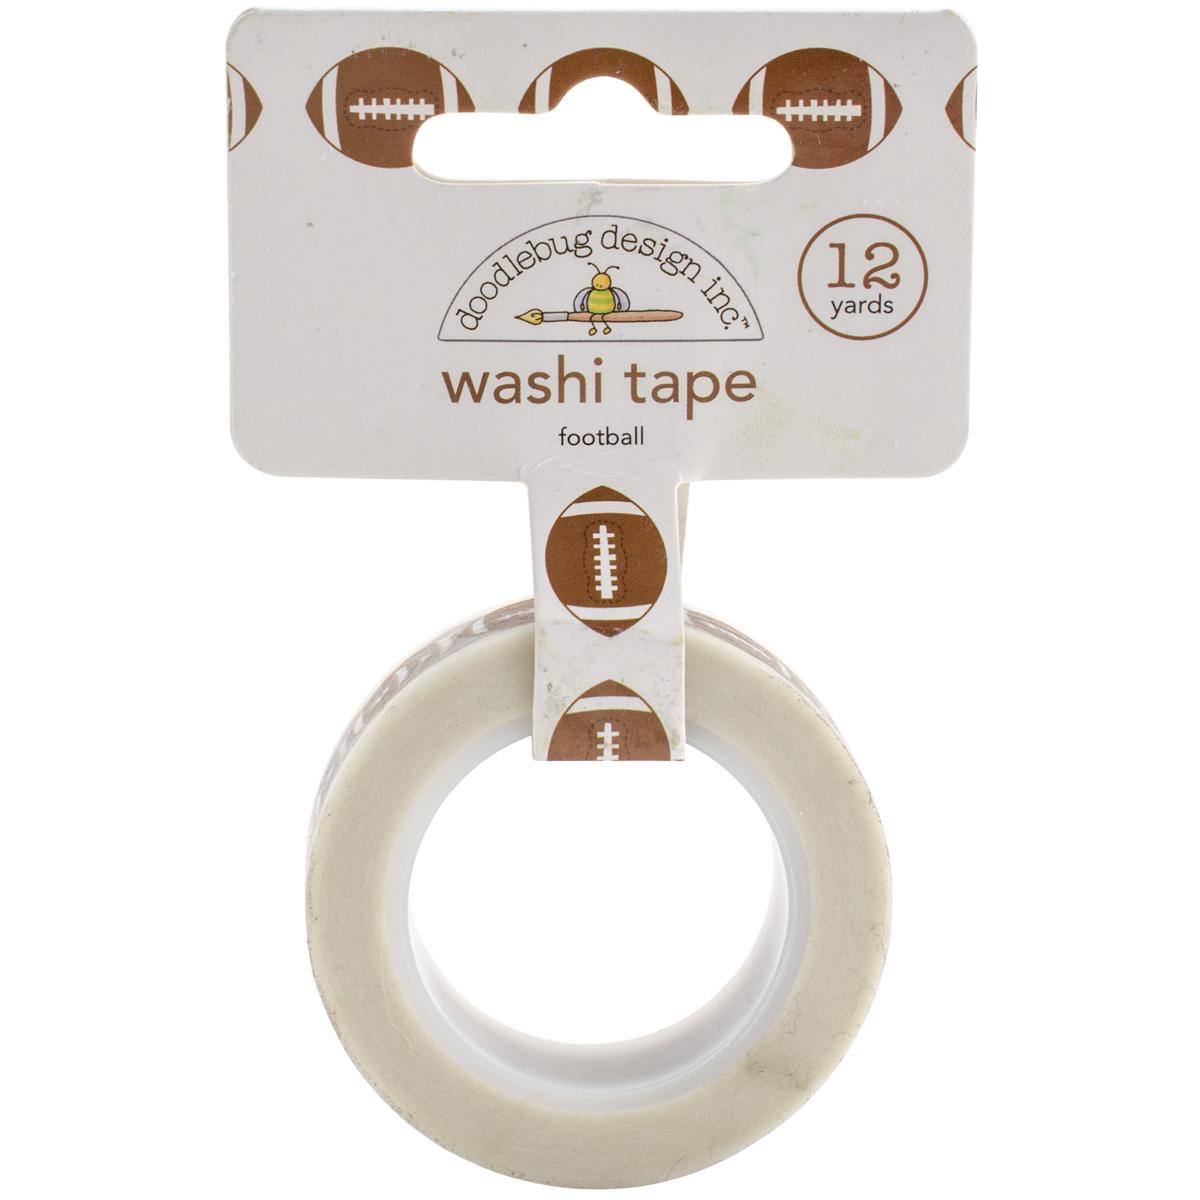 Doodlebug Washi Tape 15mmX12yd-Touchdown Footballs